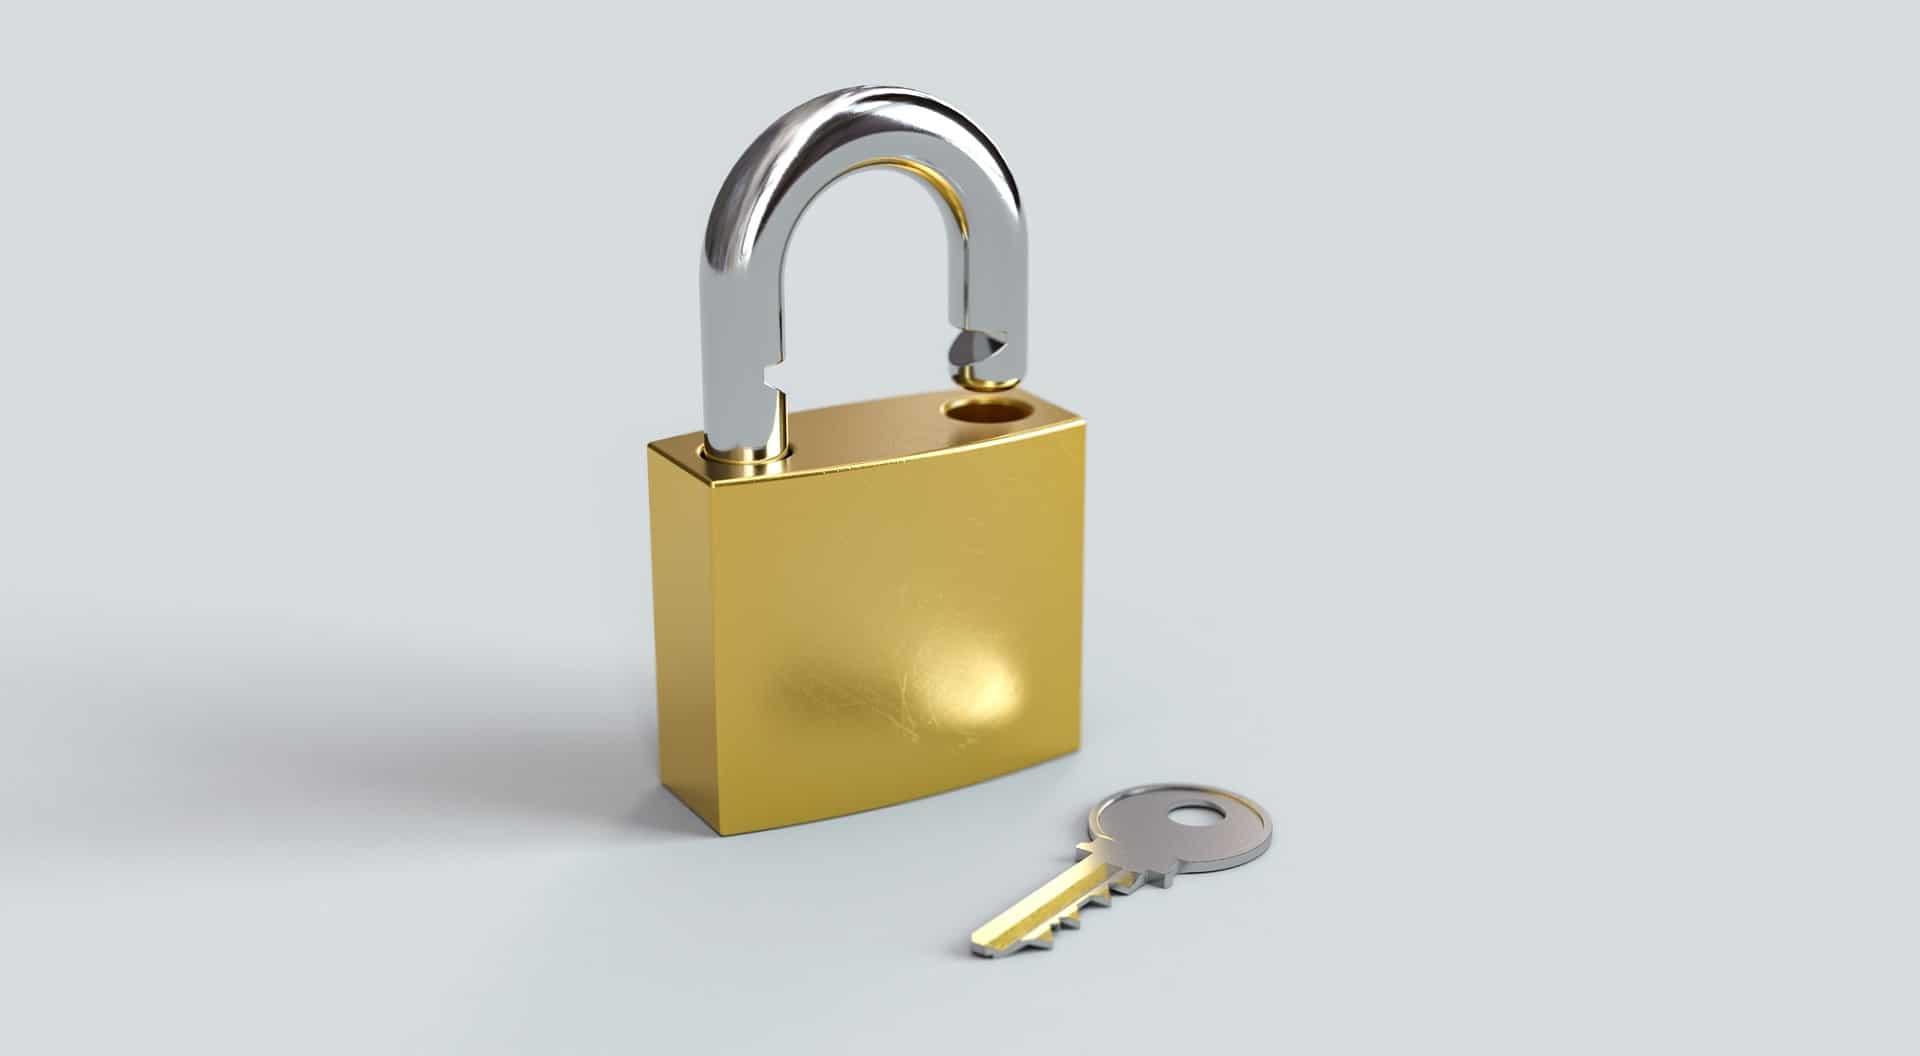 padlock-3658577-1920